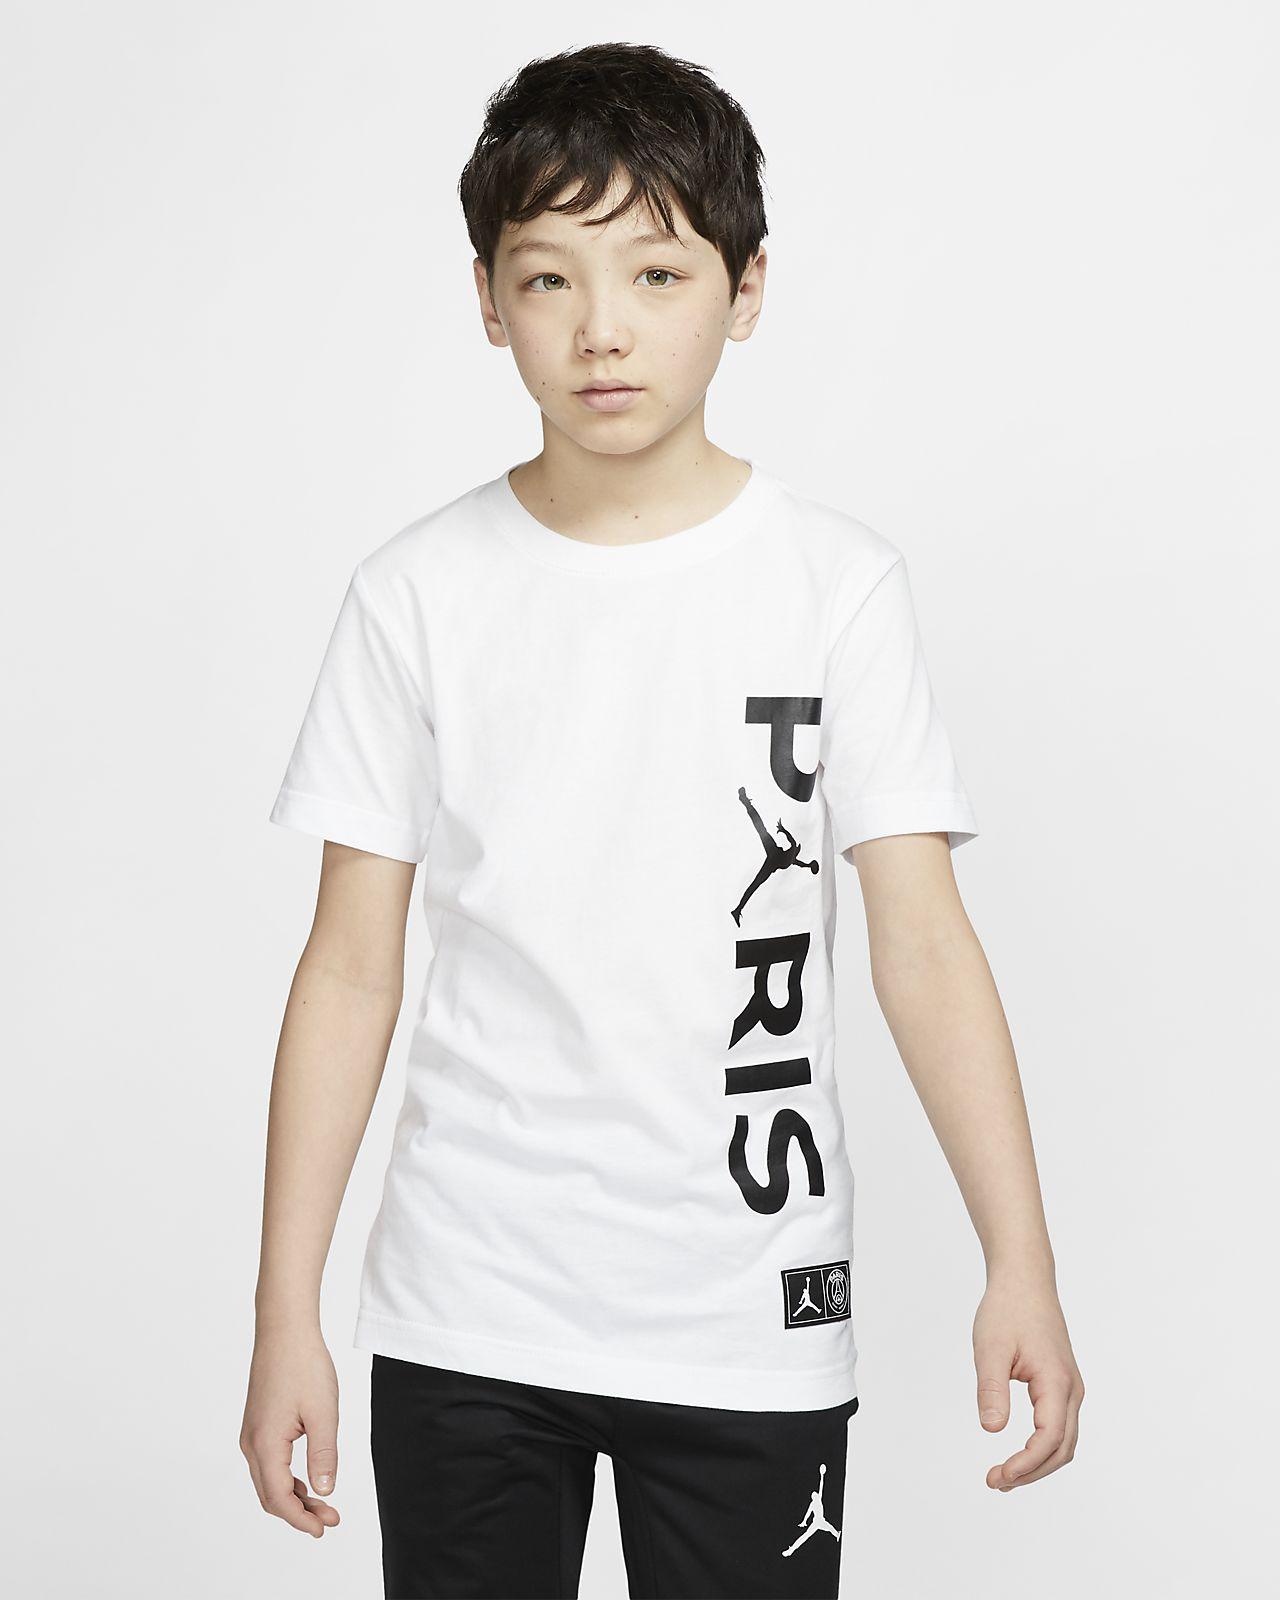 PSG Camiseta - Niño